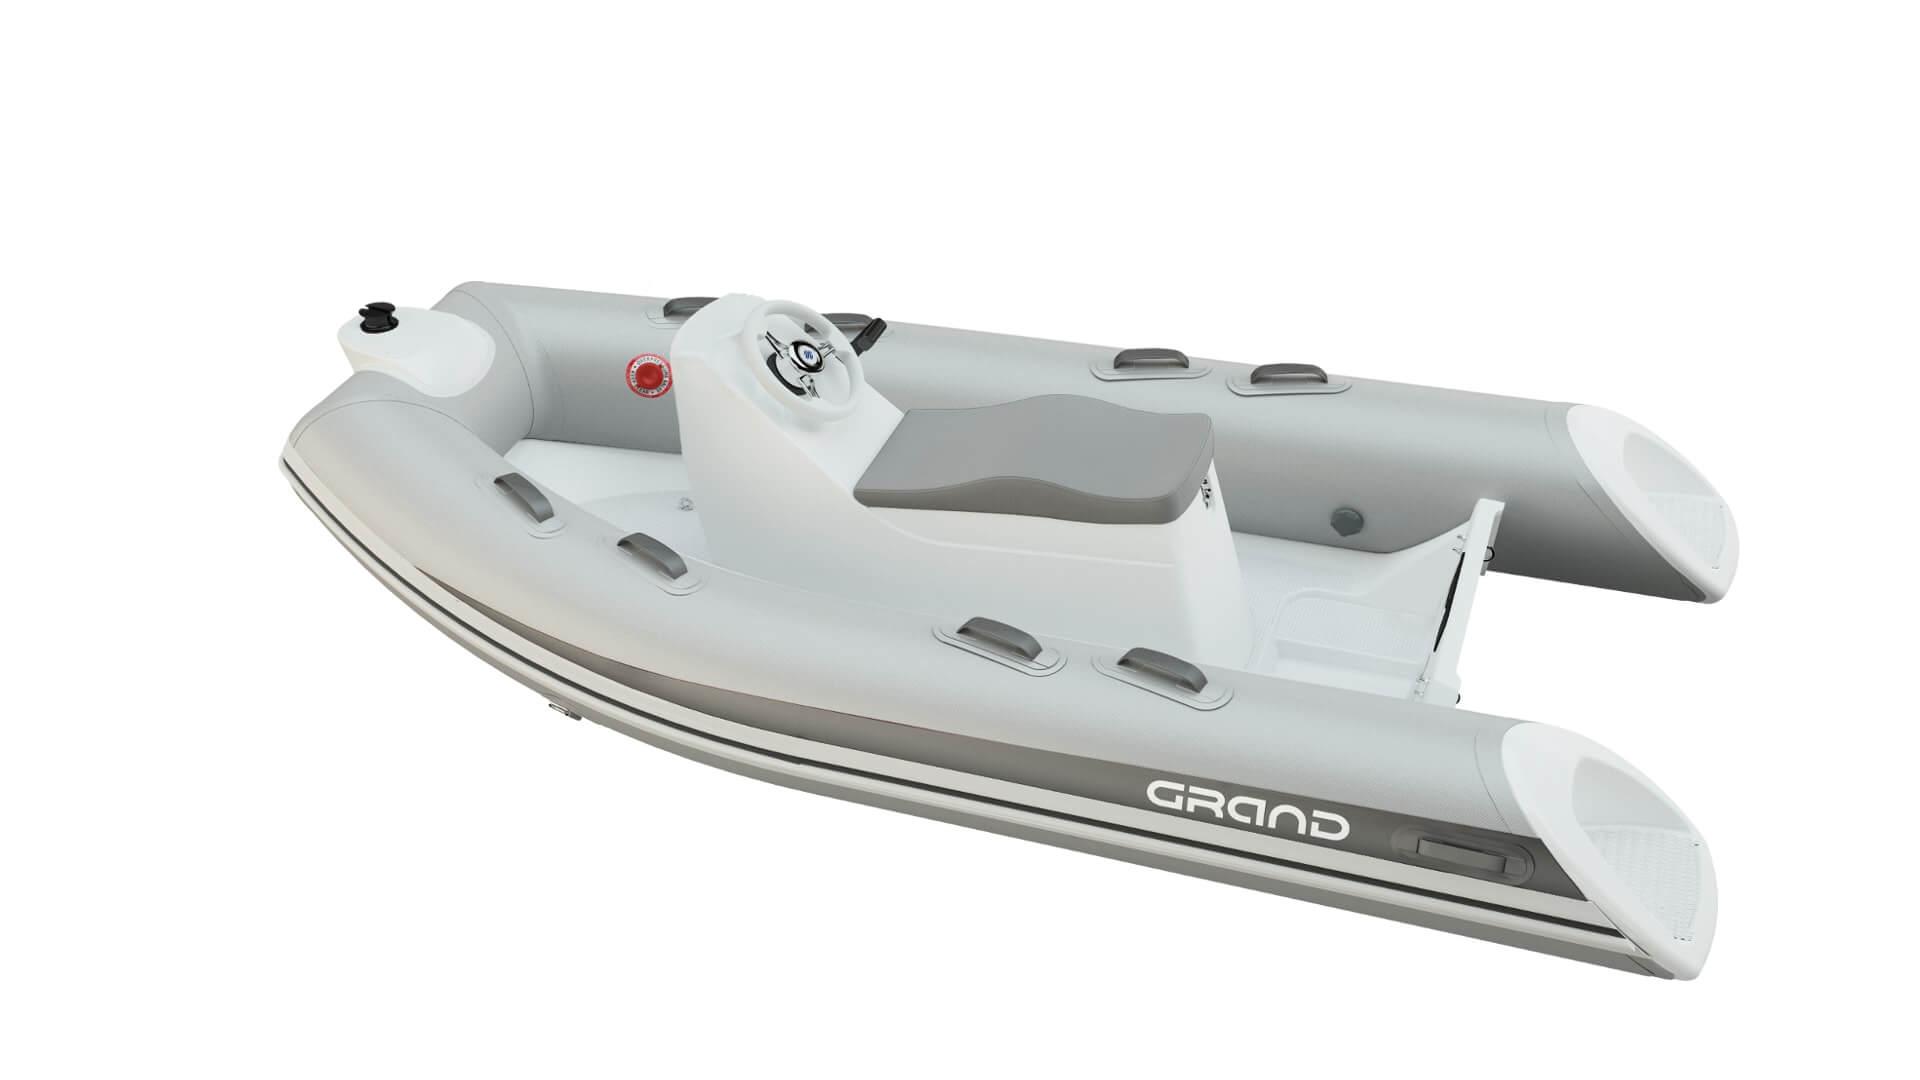 Надувная лодка с жестким дном GRAND Silver Line S300S, Надувная лодка GRAND Silver Line S300S, GRAND Silver Line S300SF, GRAND Silver Line S300S, GRAND S300SF, GRAND S300S, GRAND S300, Надувная лодка GRAND, Надувная лодка ГРАНД, Надувная лодка с жестким дном, RIB, Rigid Inflatable Boats